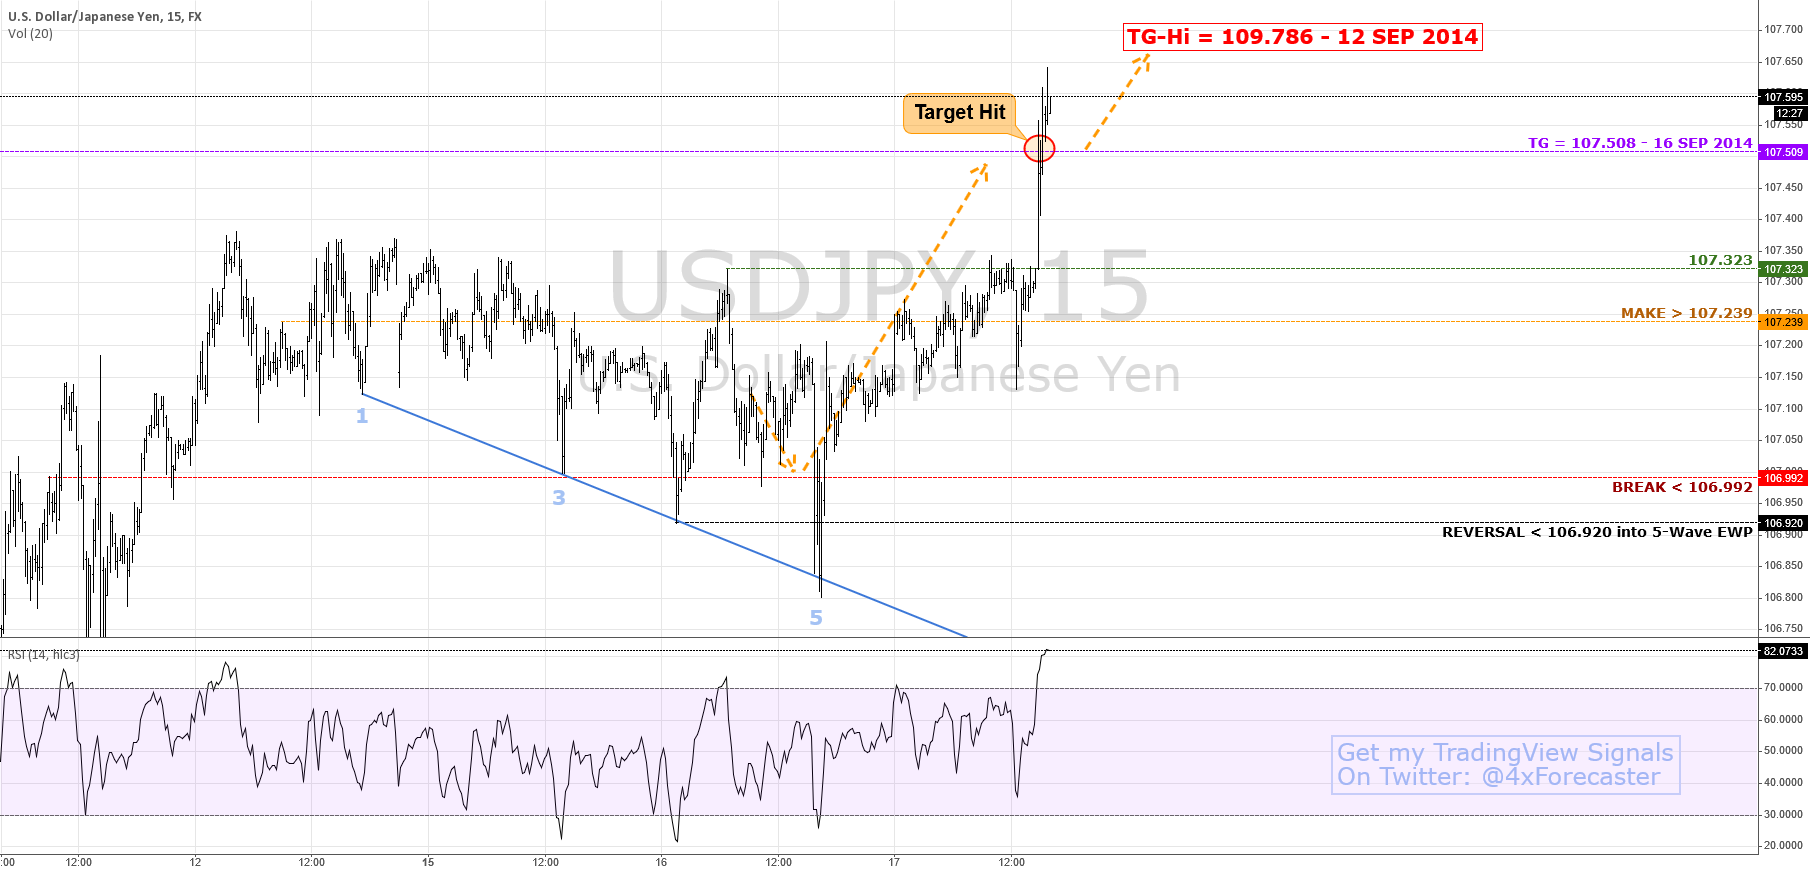 $JPY Hit Forecast TG @ 107.509; Eyes TG-Hi @ 109.786 | #forex